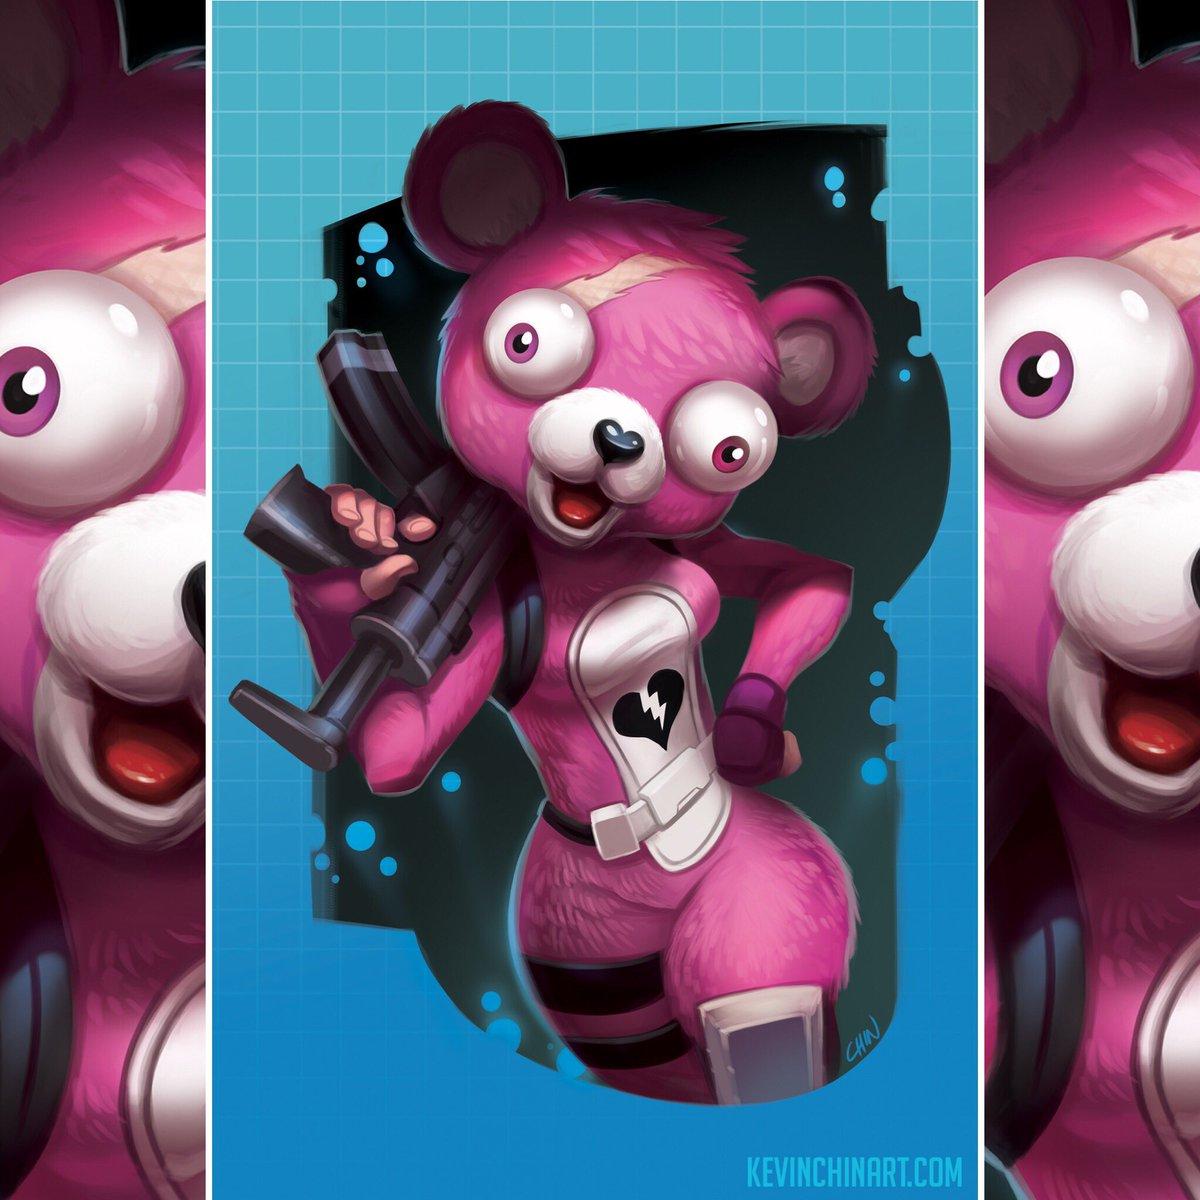 Kevin t chin on twitter cuddle team leader fortnite fanart cuddleteamleader - Panda team leader costume ...